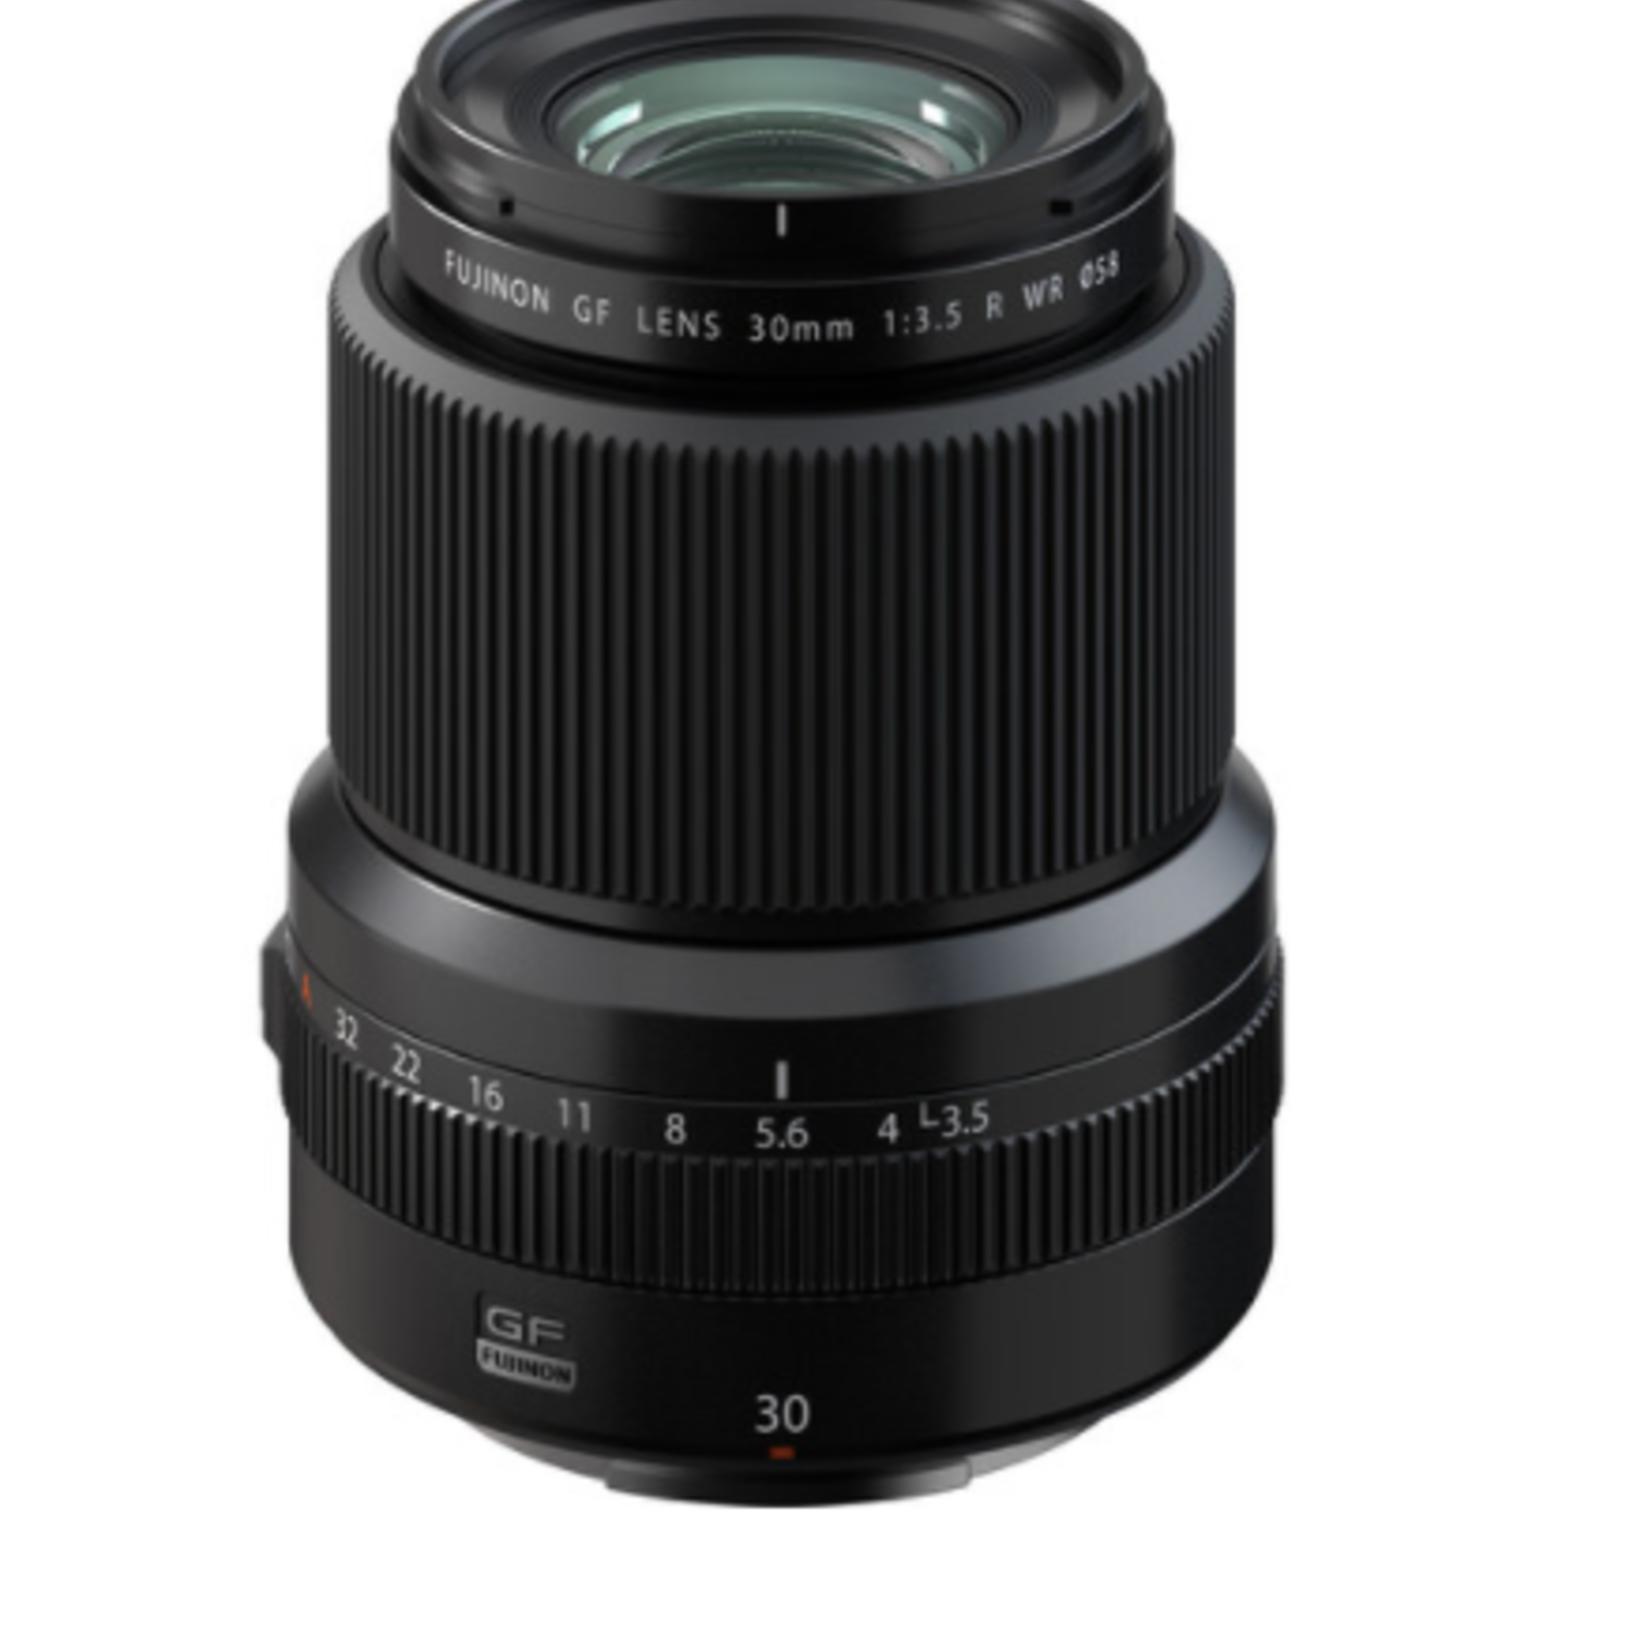 FujiFilm FUJIFILM GF 30mm f/3.5 R WR Lens